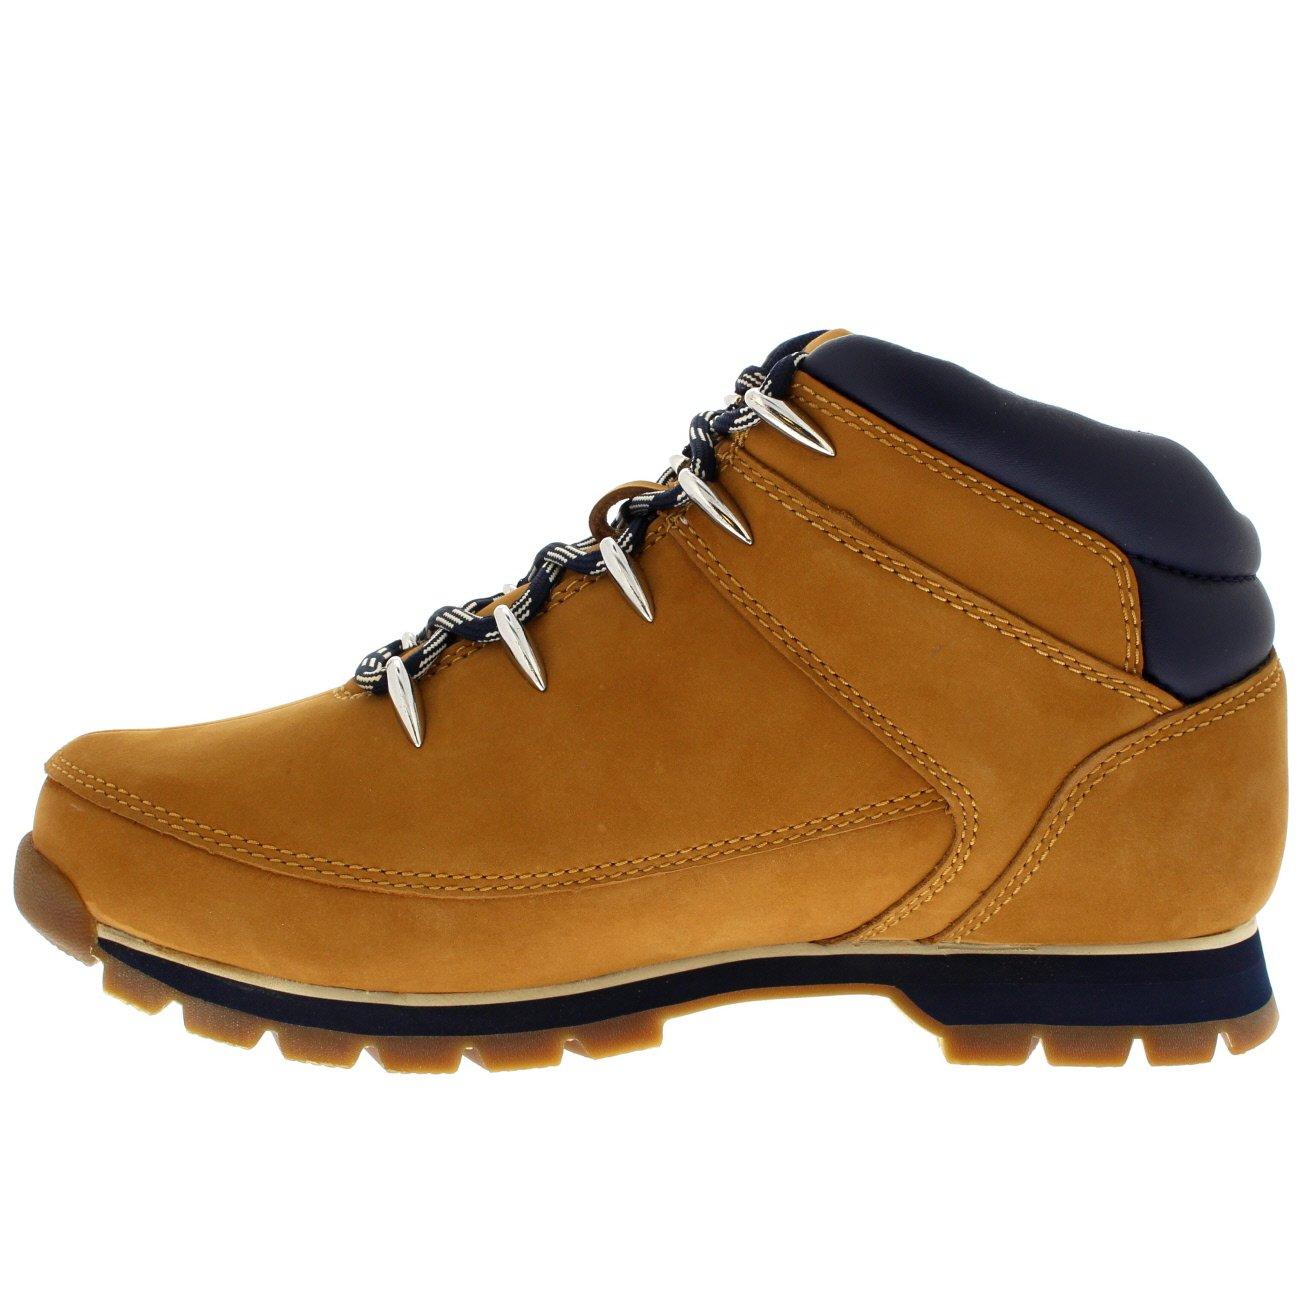 Chaussures Randonn Randonn Chaussures Randonn Chaussures RxxBgwEq